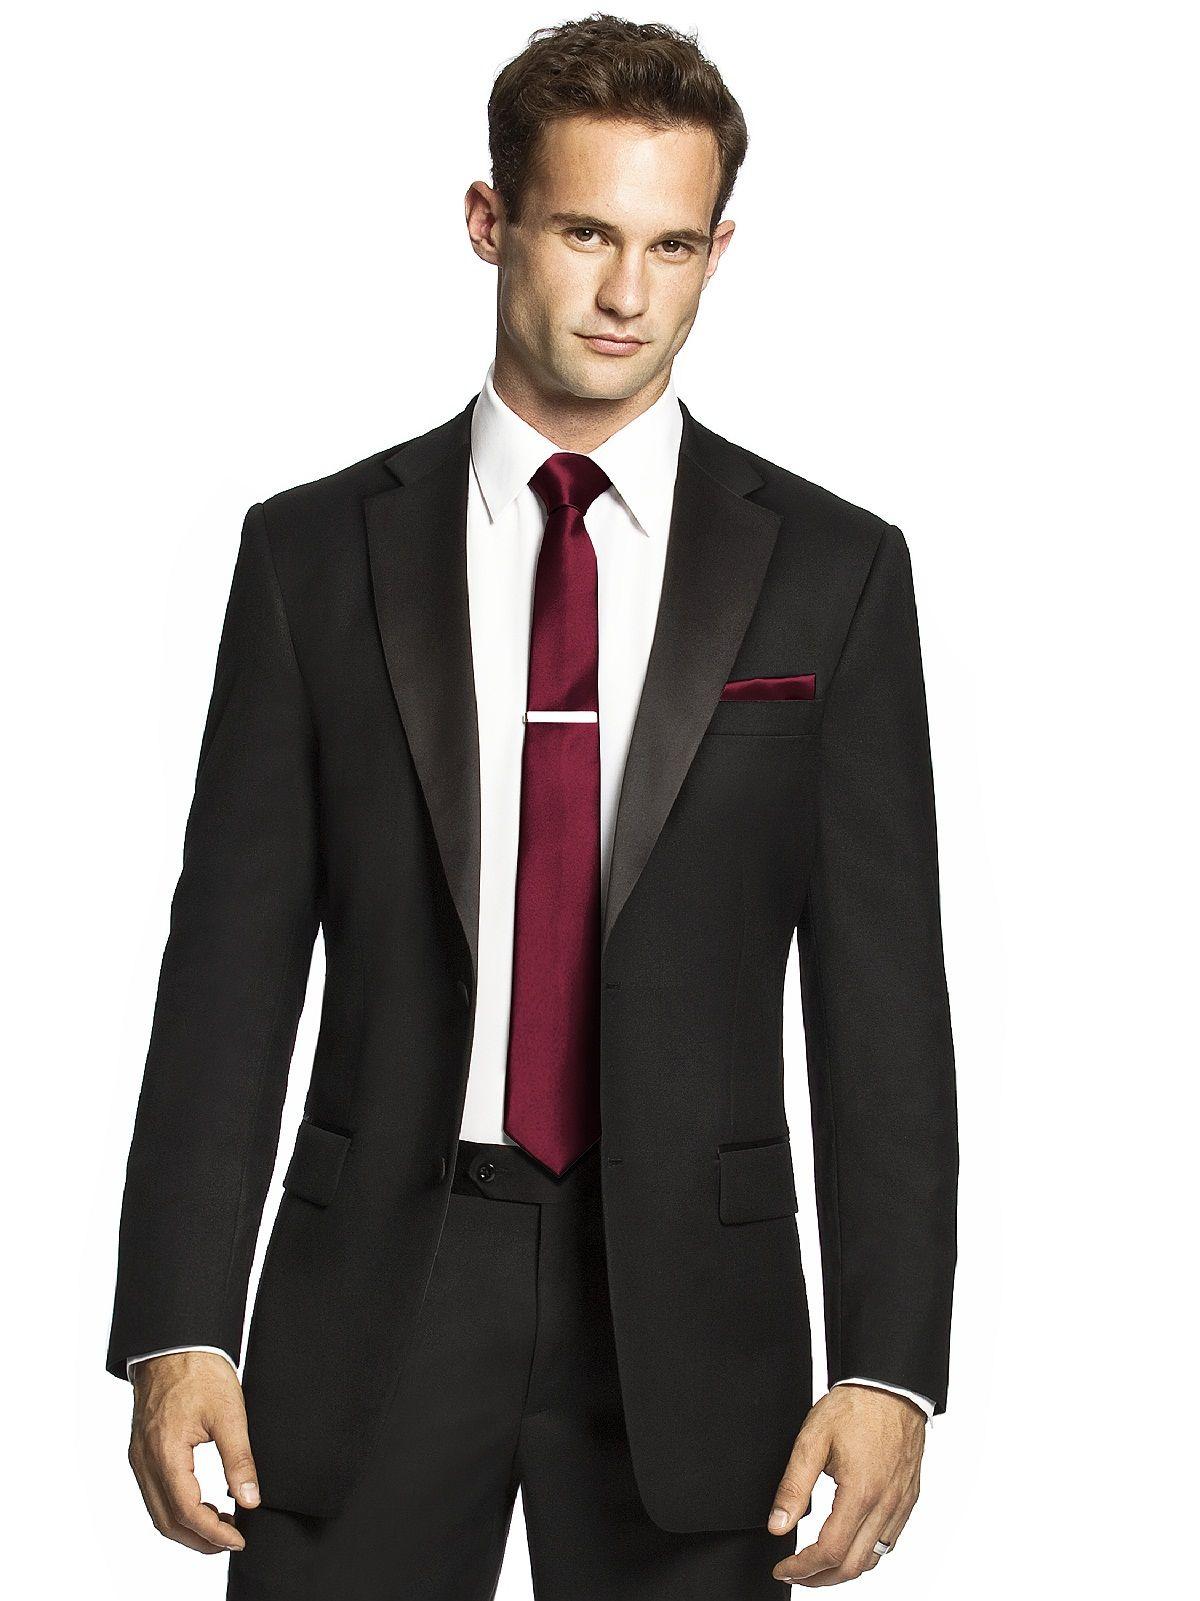 Satin Solid Necktie Skinny Tie Suit Formal Wedding Party indian man Accessories